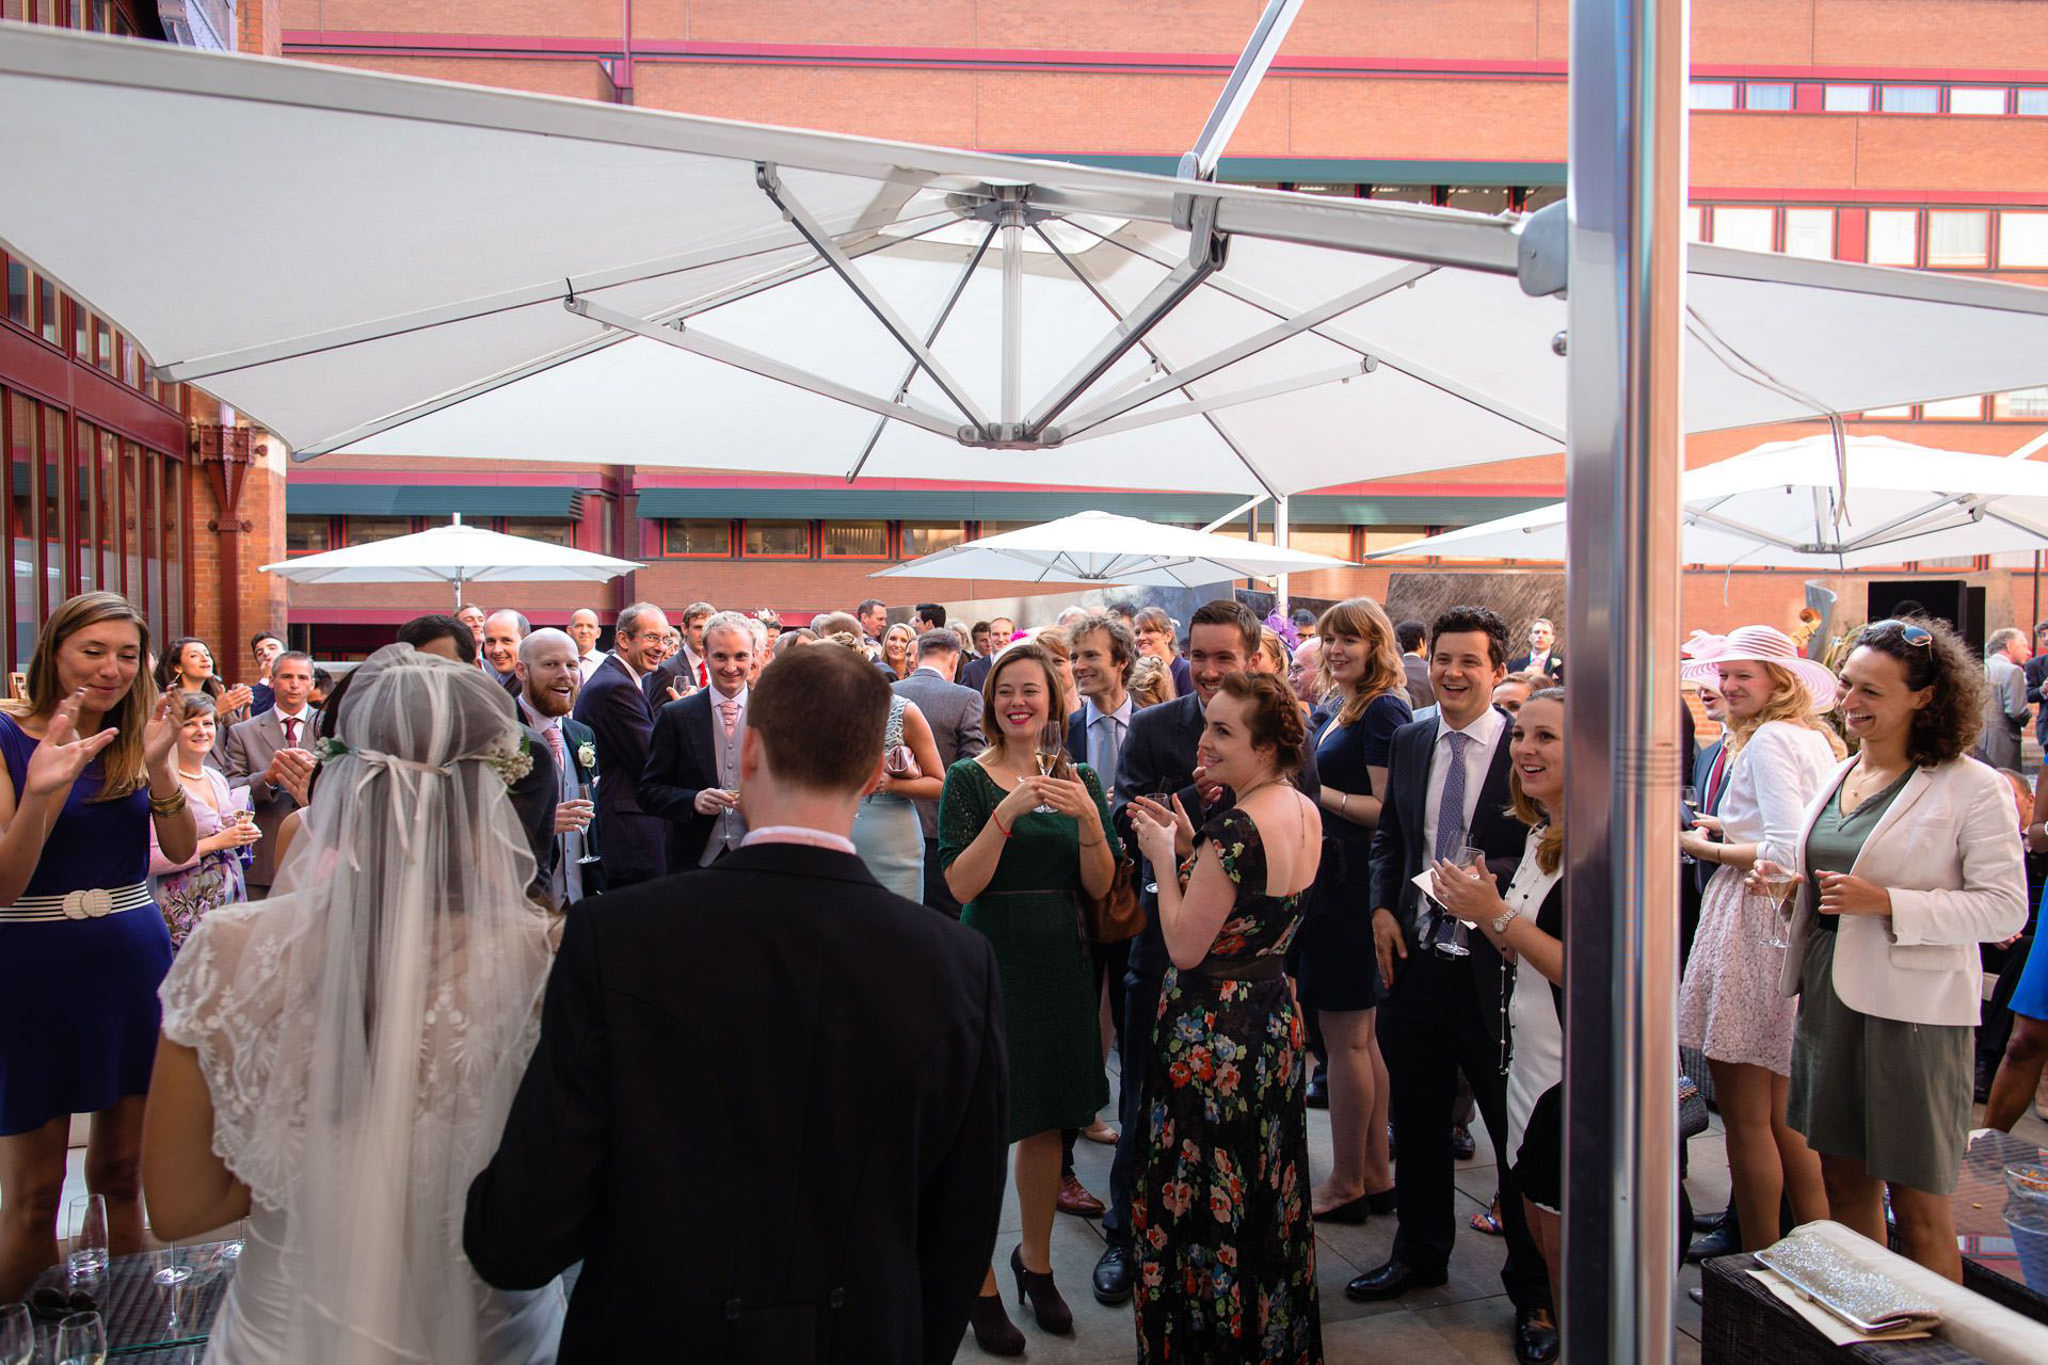 St. Pancras hotel wedding married couple enter reception